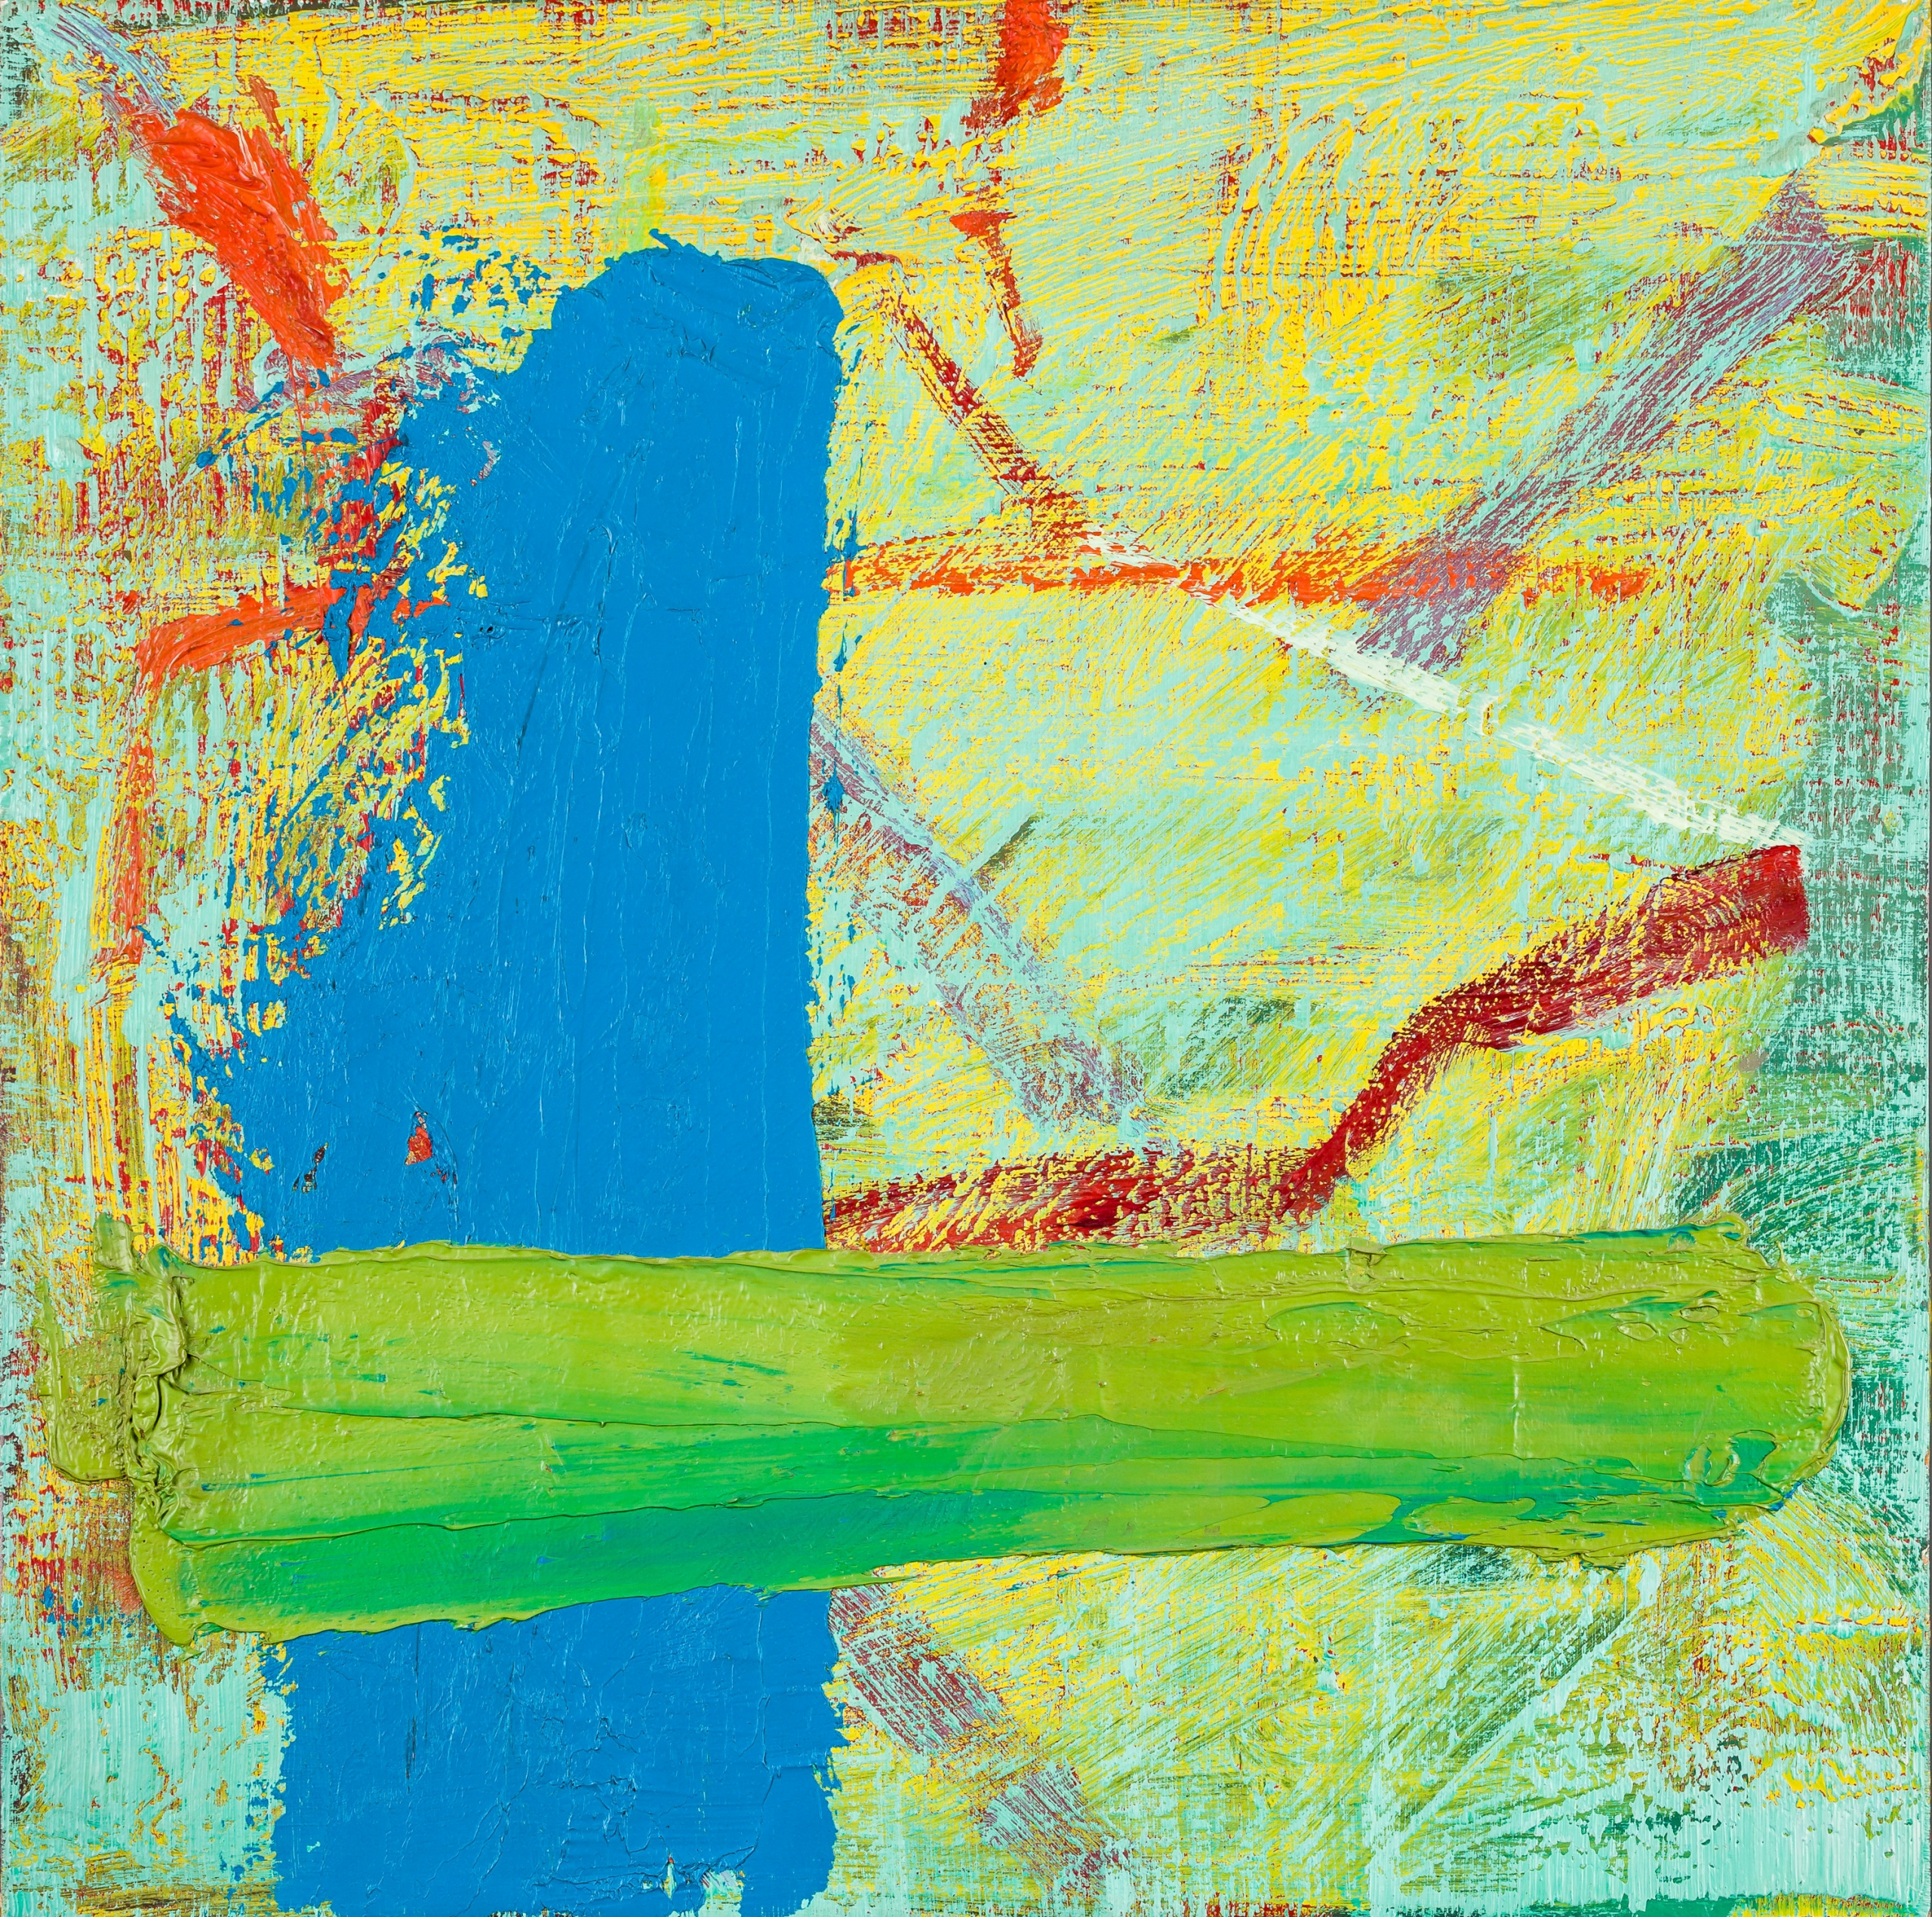 Gerhard Richter, Abstraktes Bild (432/8)